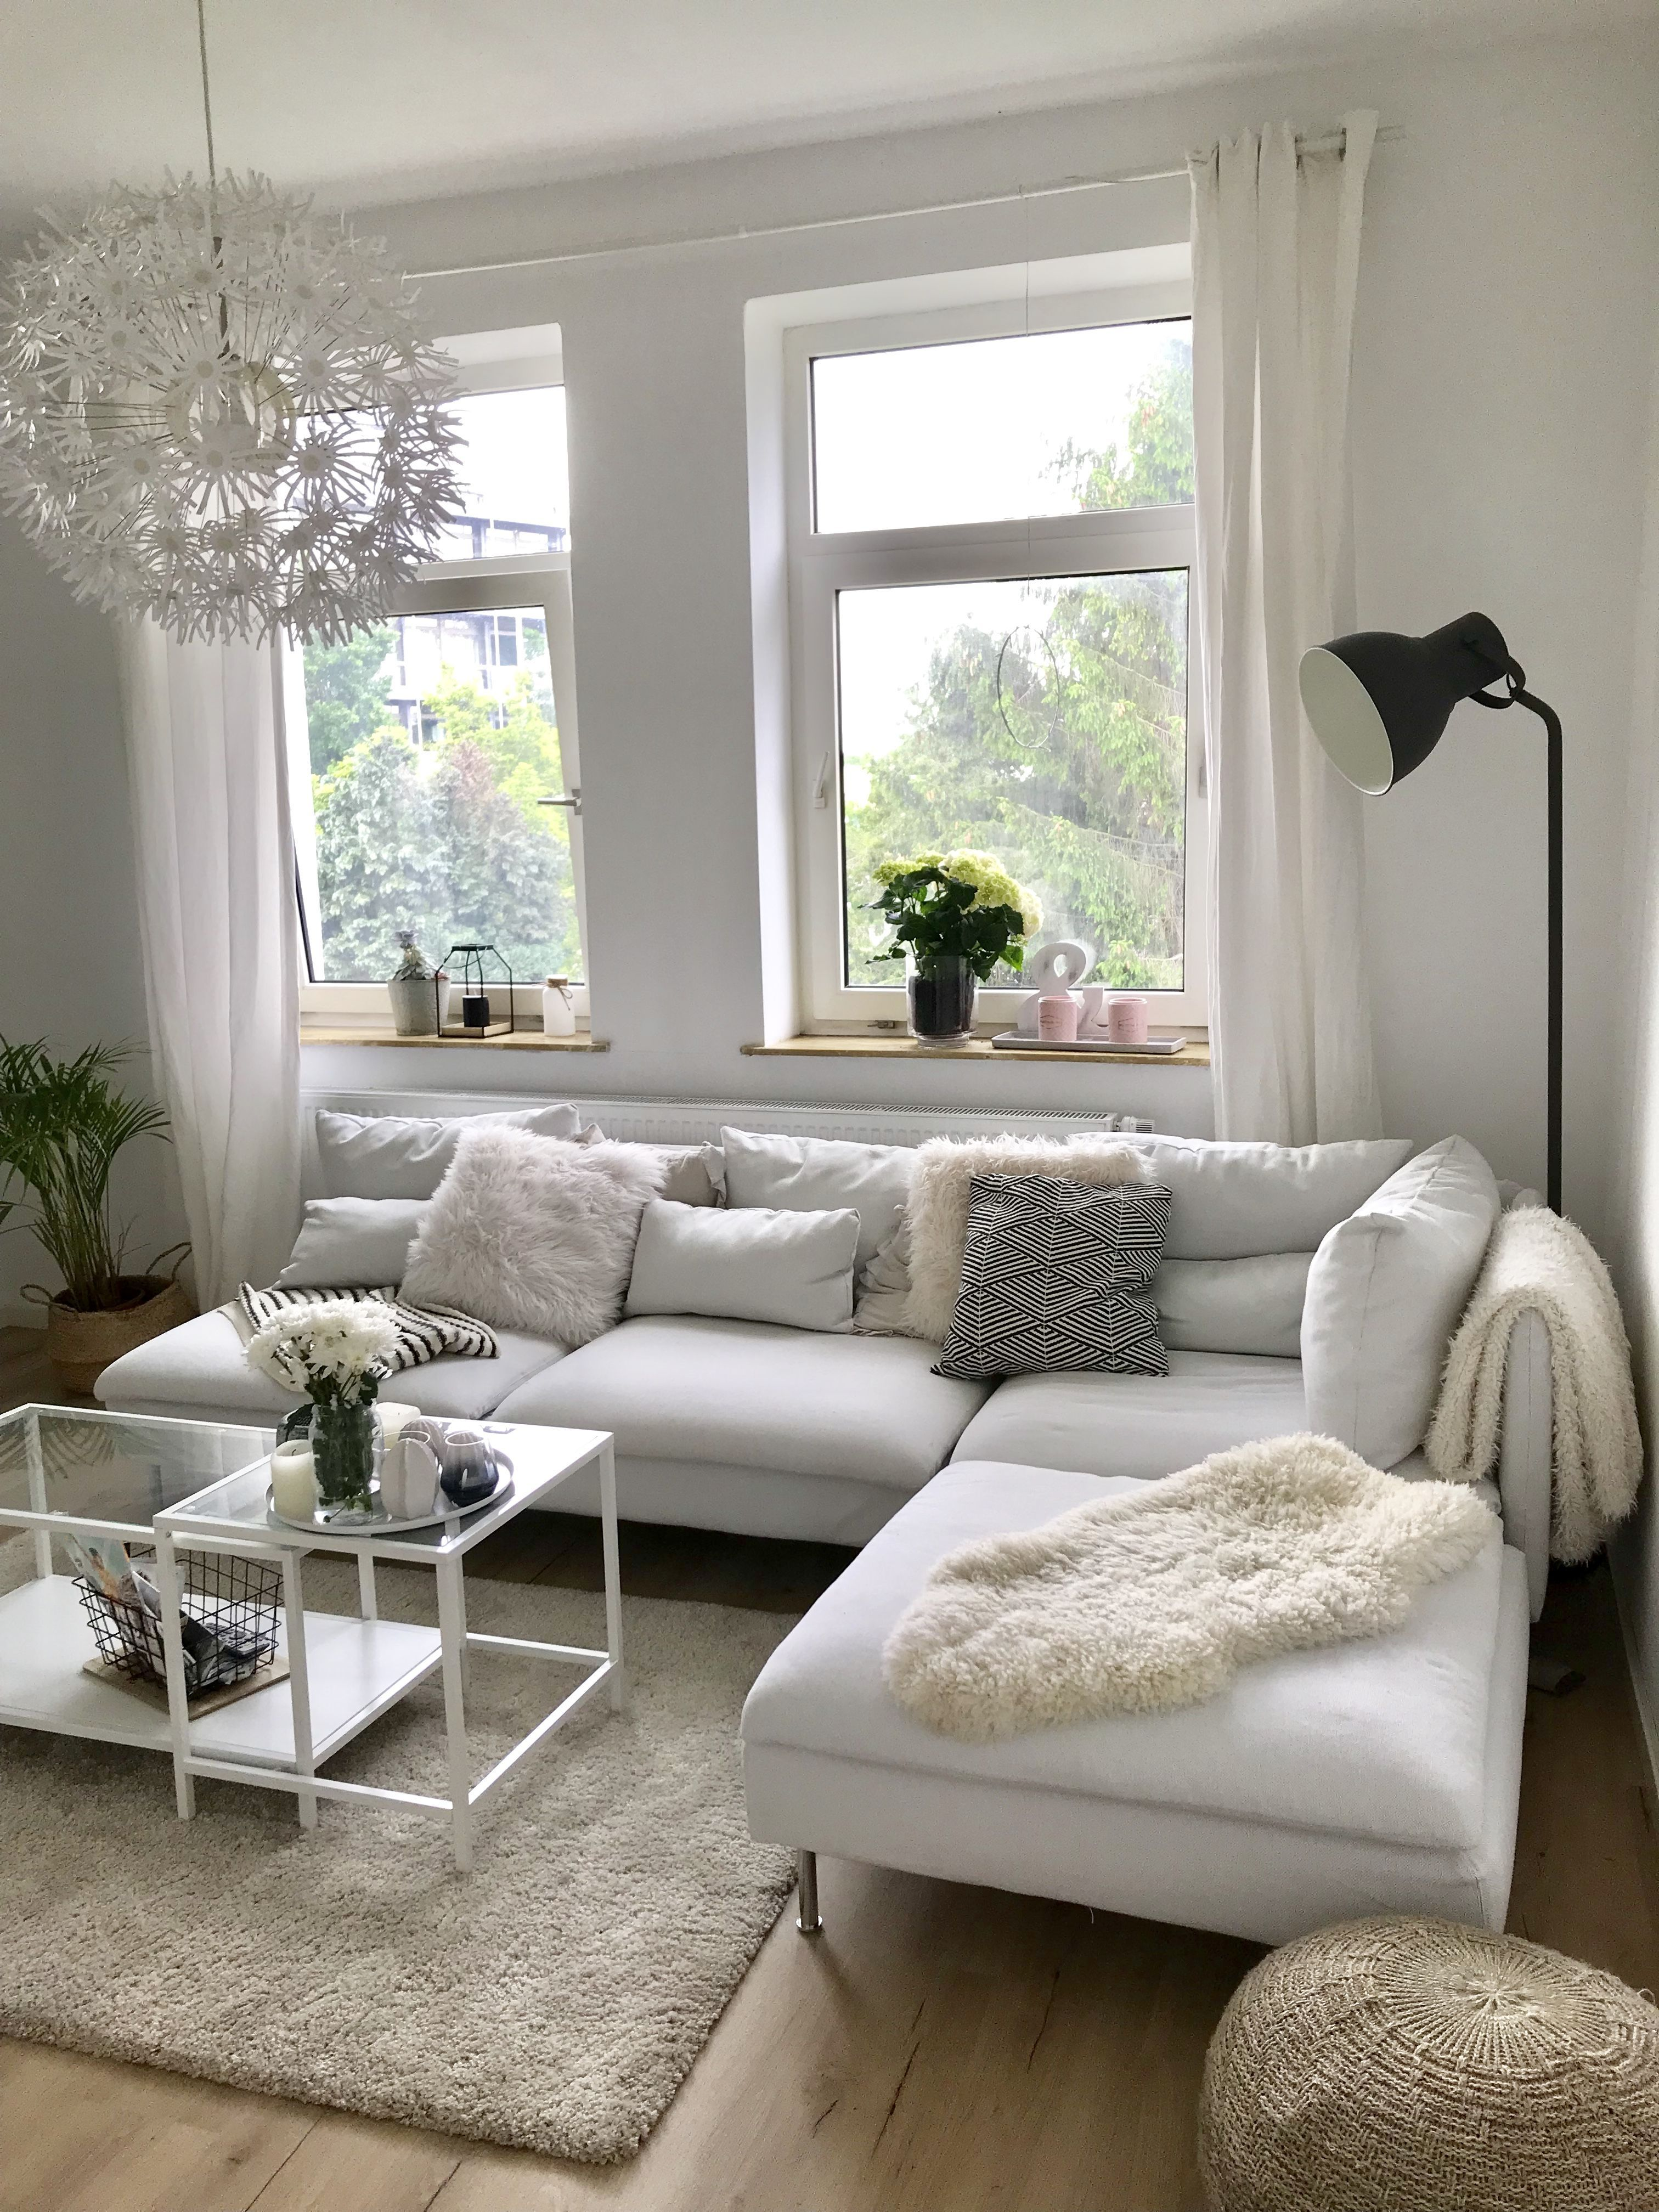 Ikea Inspirationen South Harbor In 2020 Pine Living Room